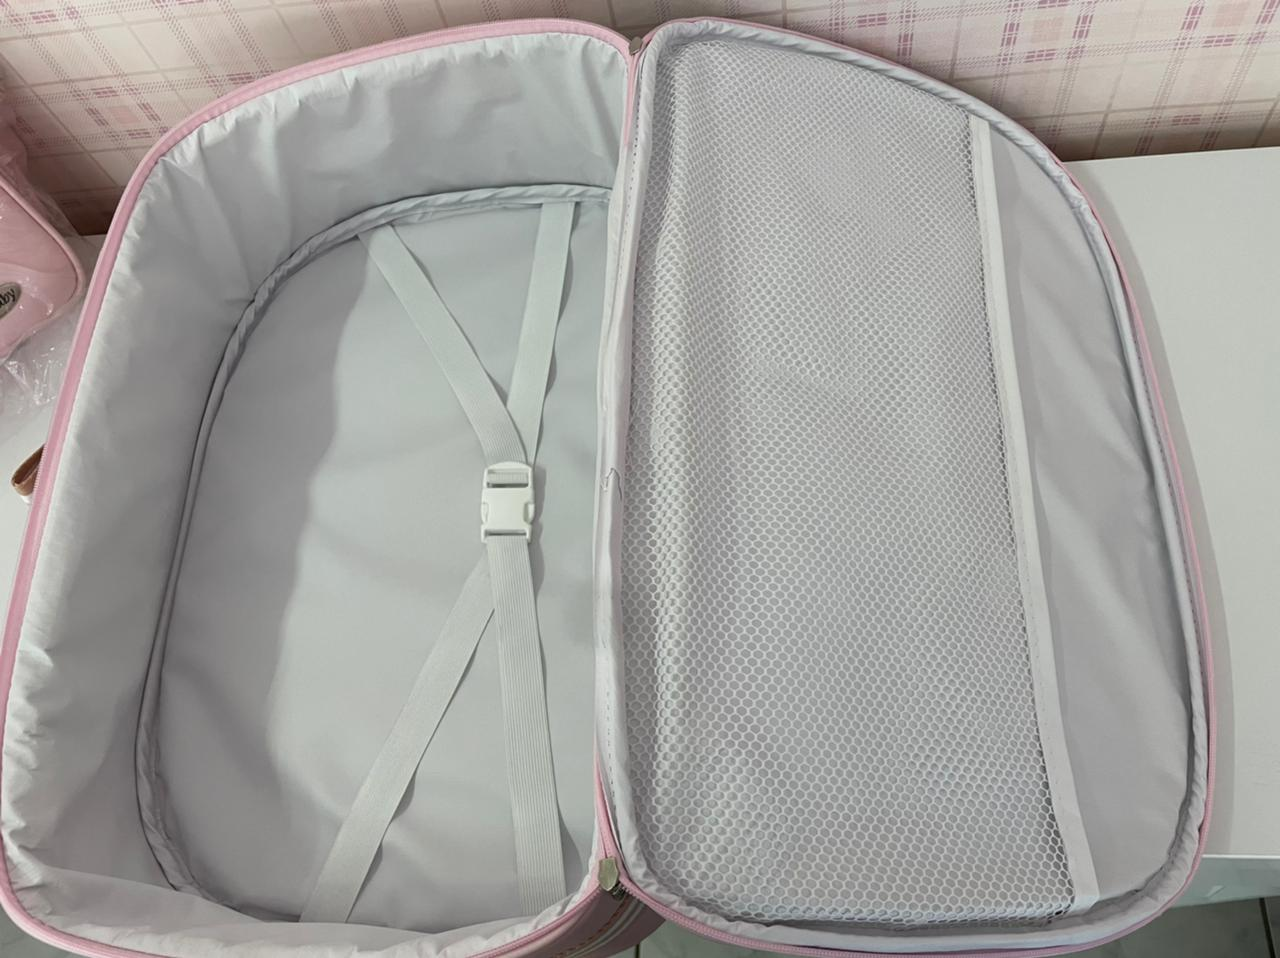 Kit de malas Premium Azul marinho